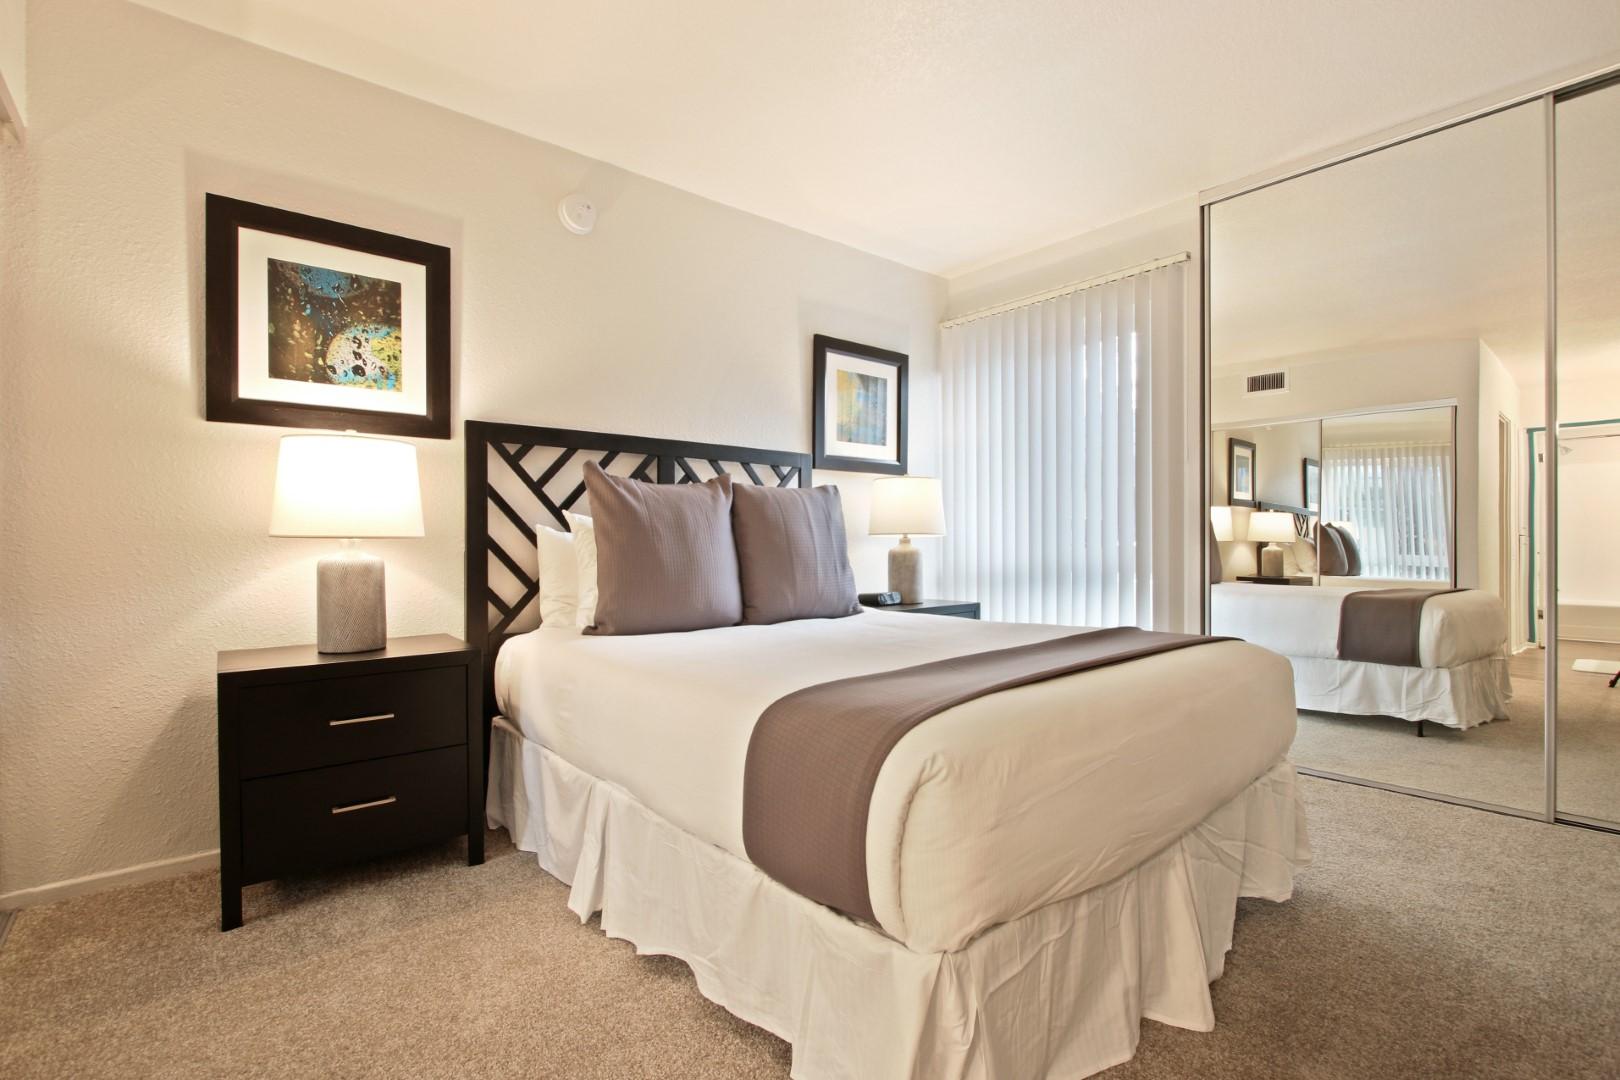 Bedroom at Ava Toluca Hills Apartments, Toluca Lake, Los Angeles